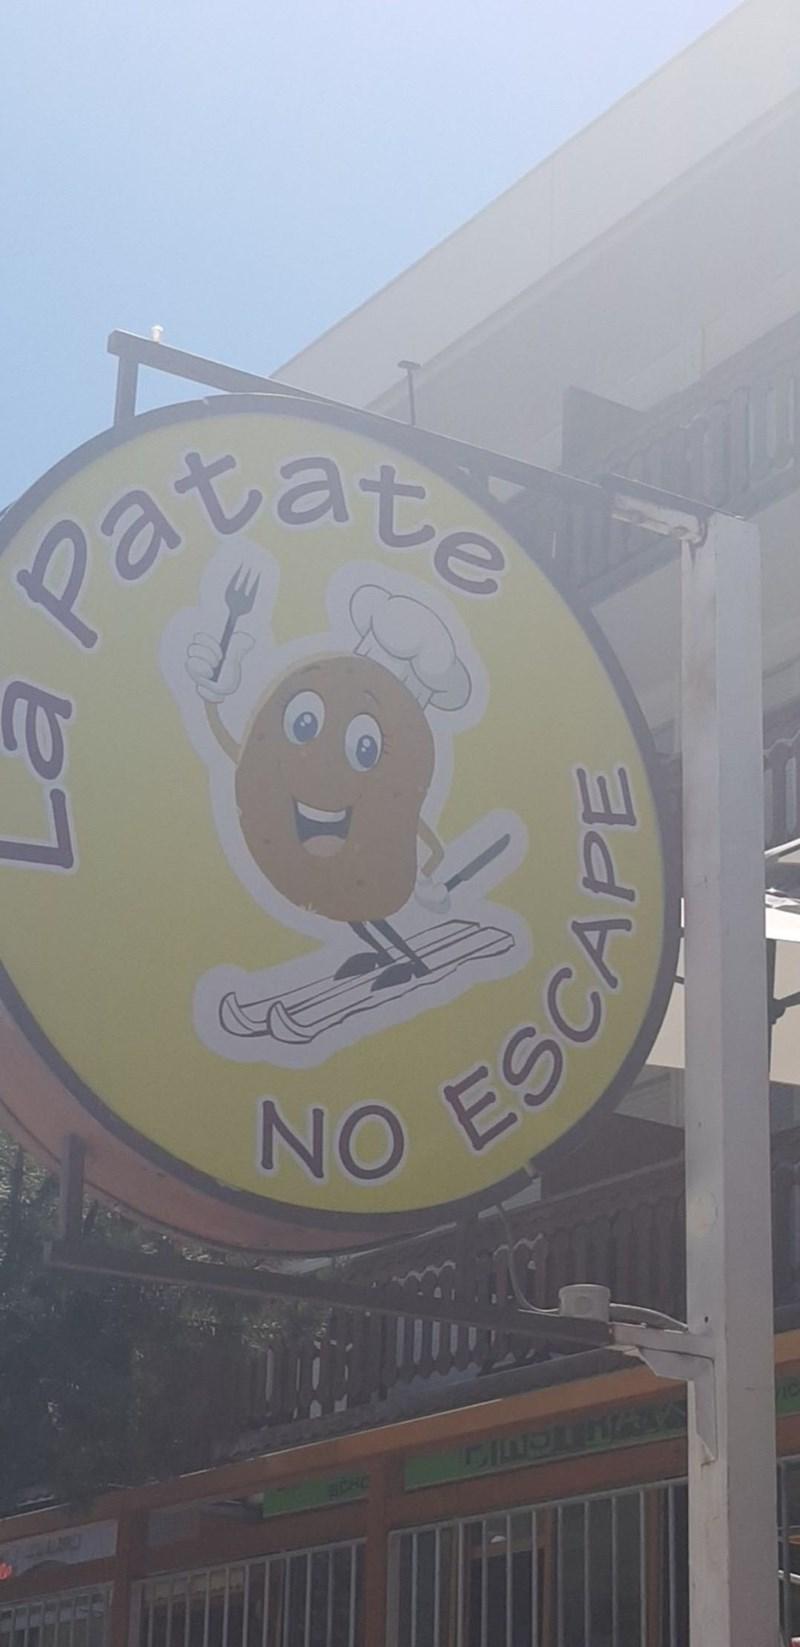 Signage - Pavate NO ESC